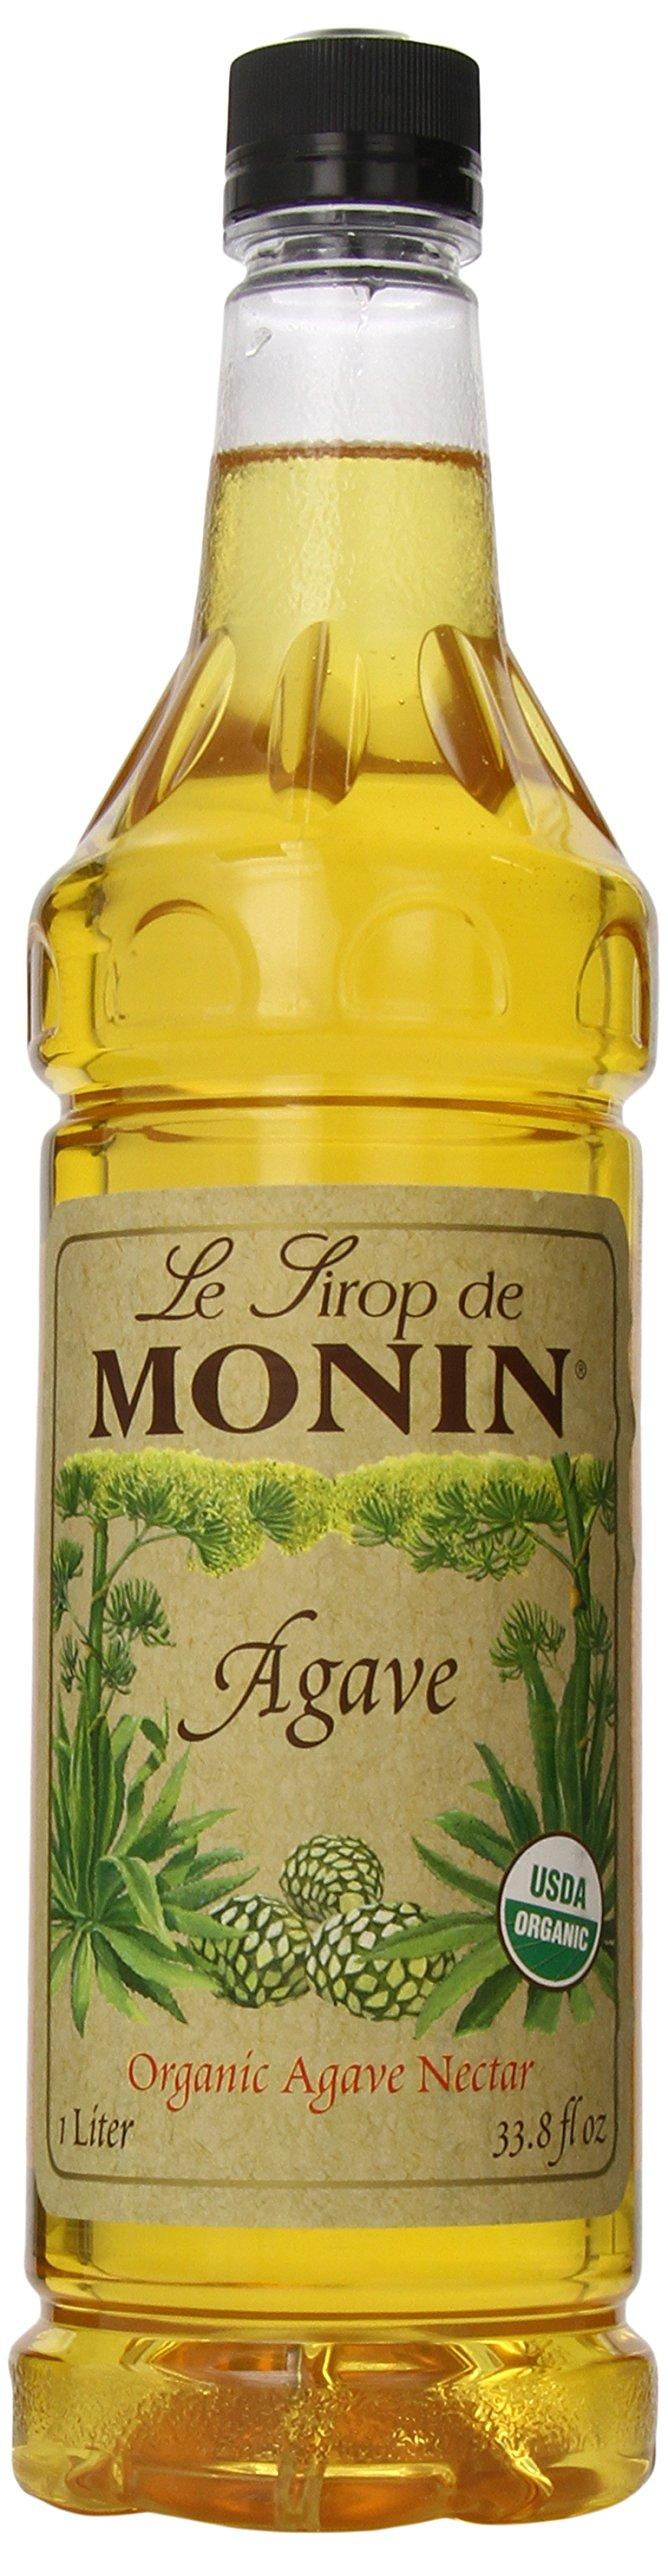 MONIN Agave Nectar Sweetner, 33.8-Ounce